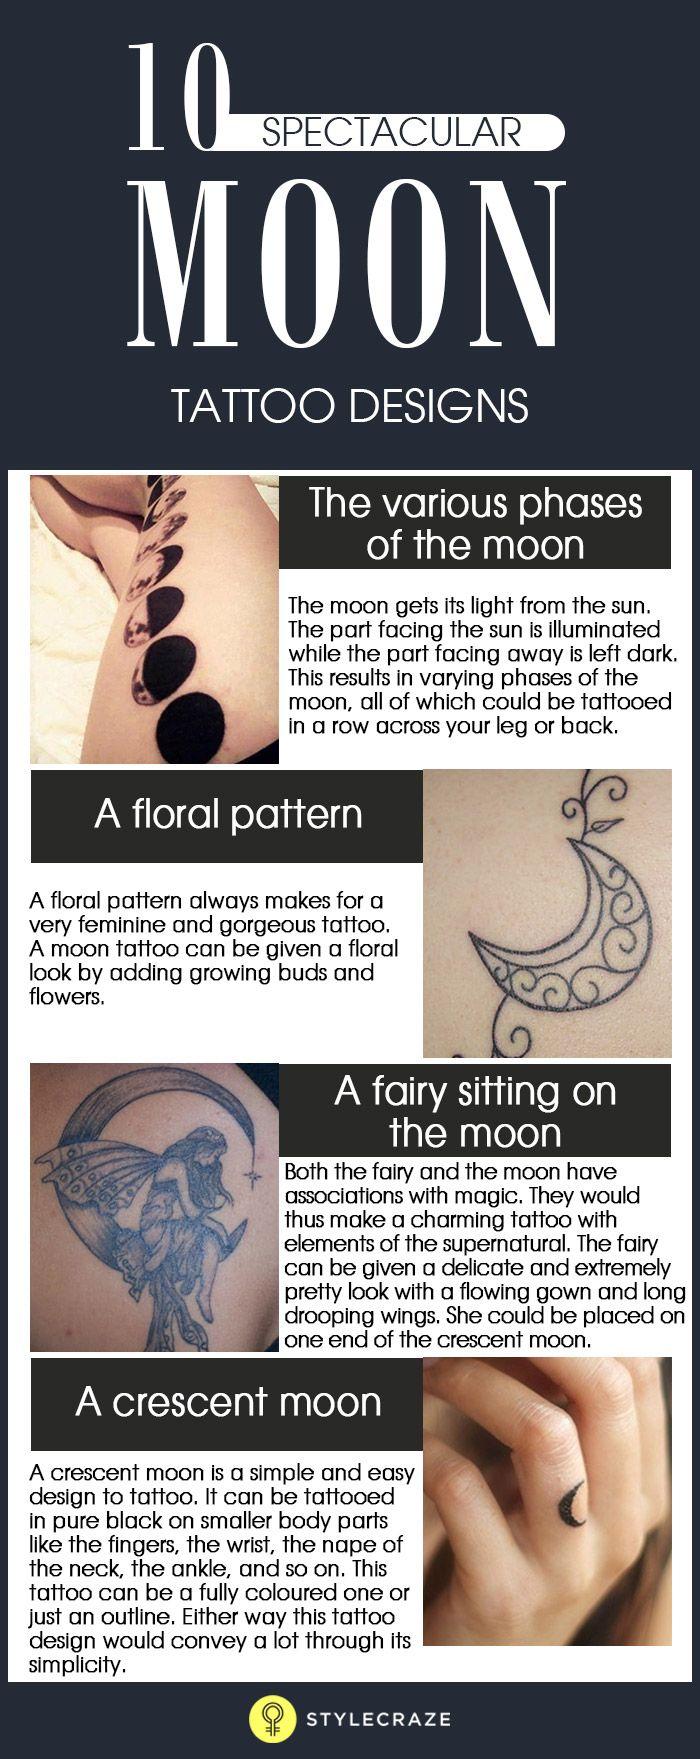 10 Spectacular Moon Tattoo Designs